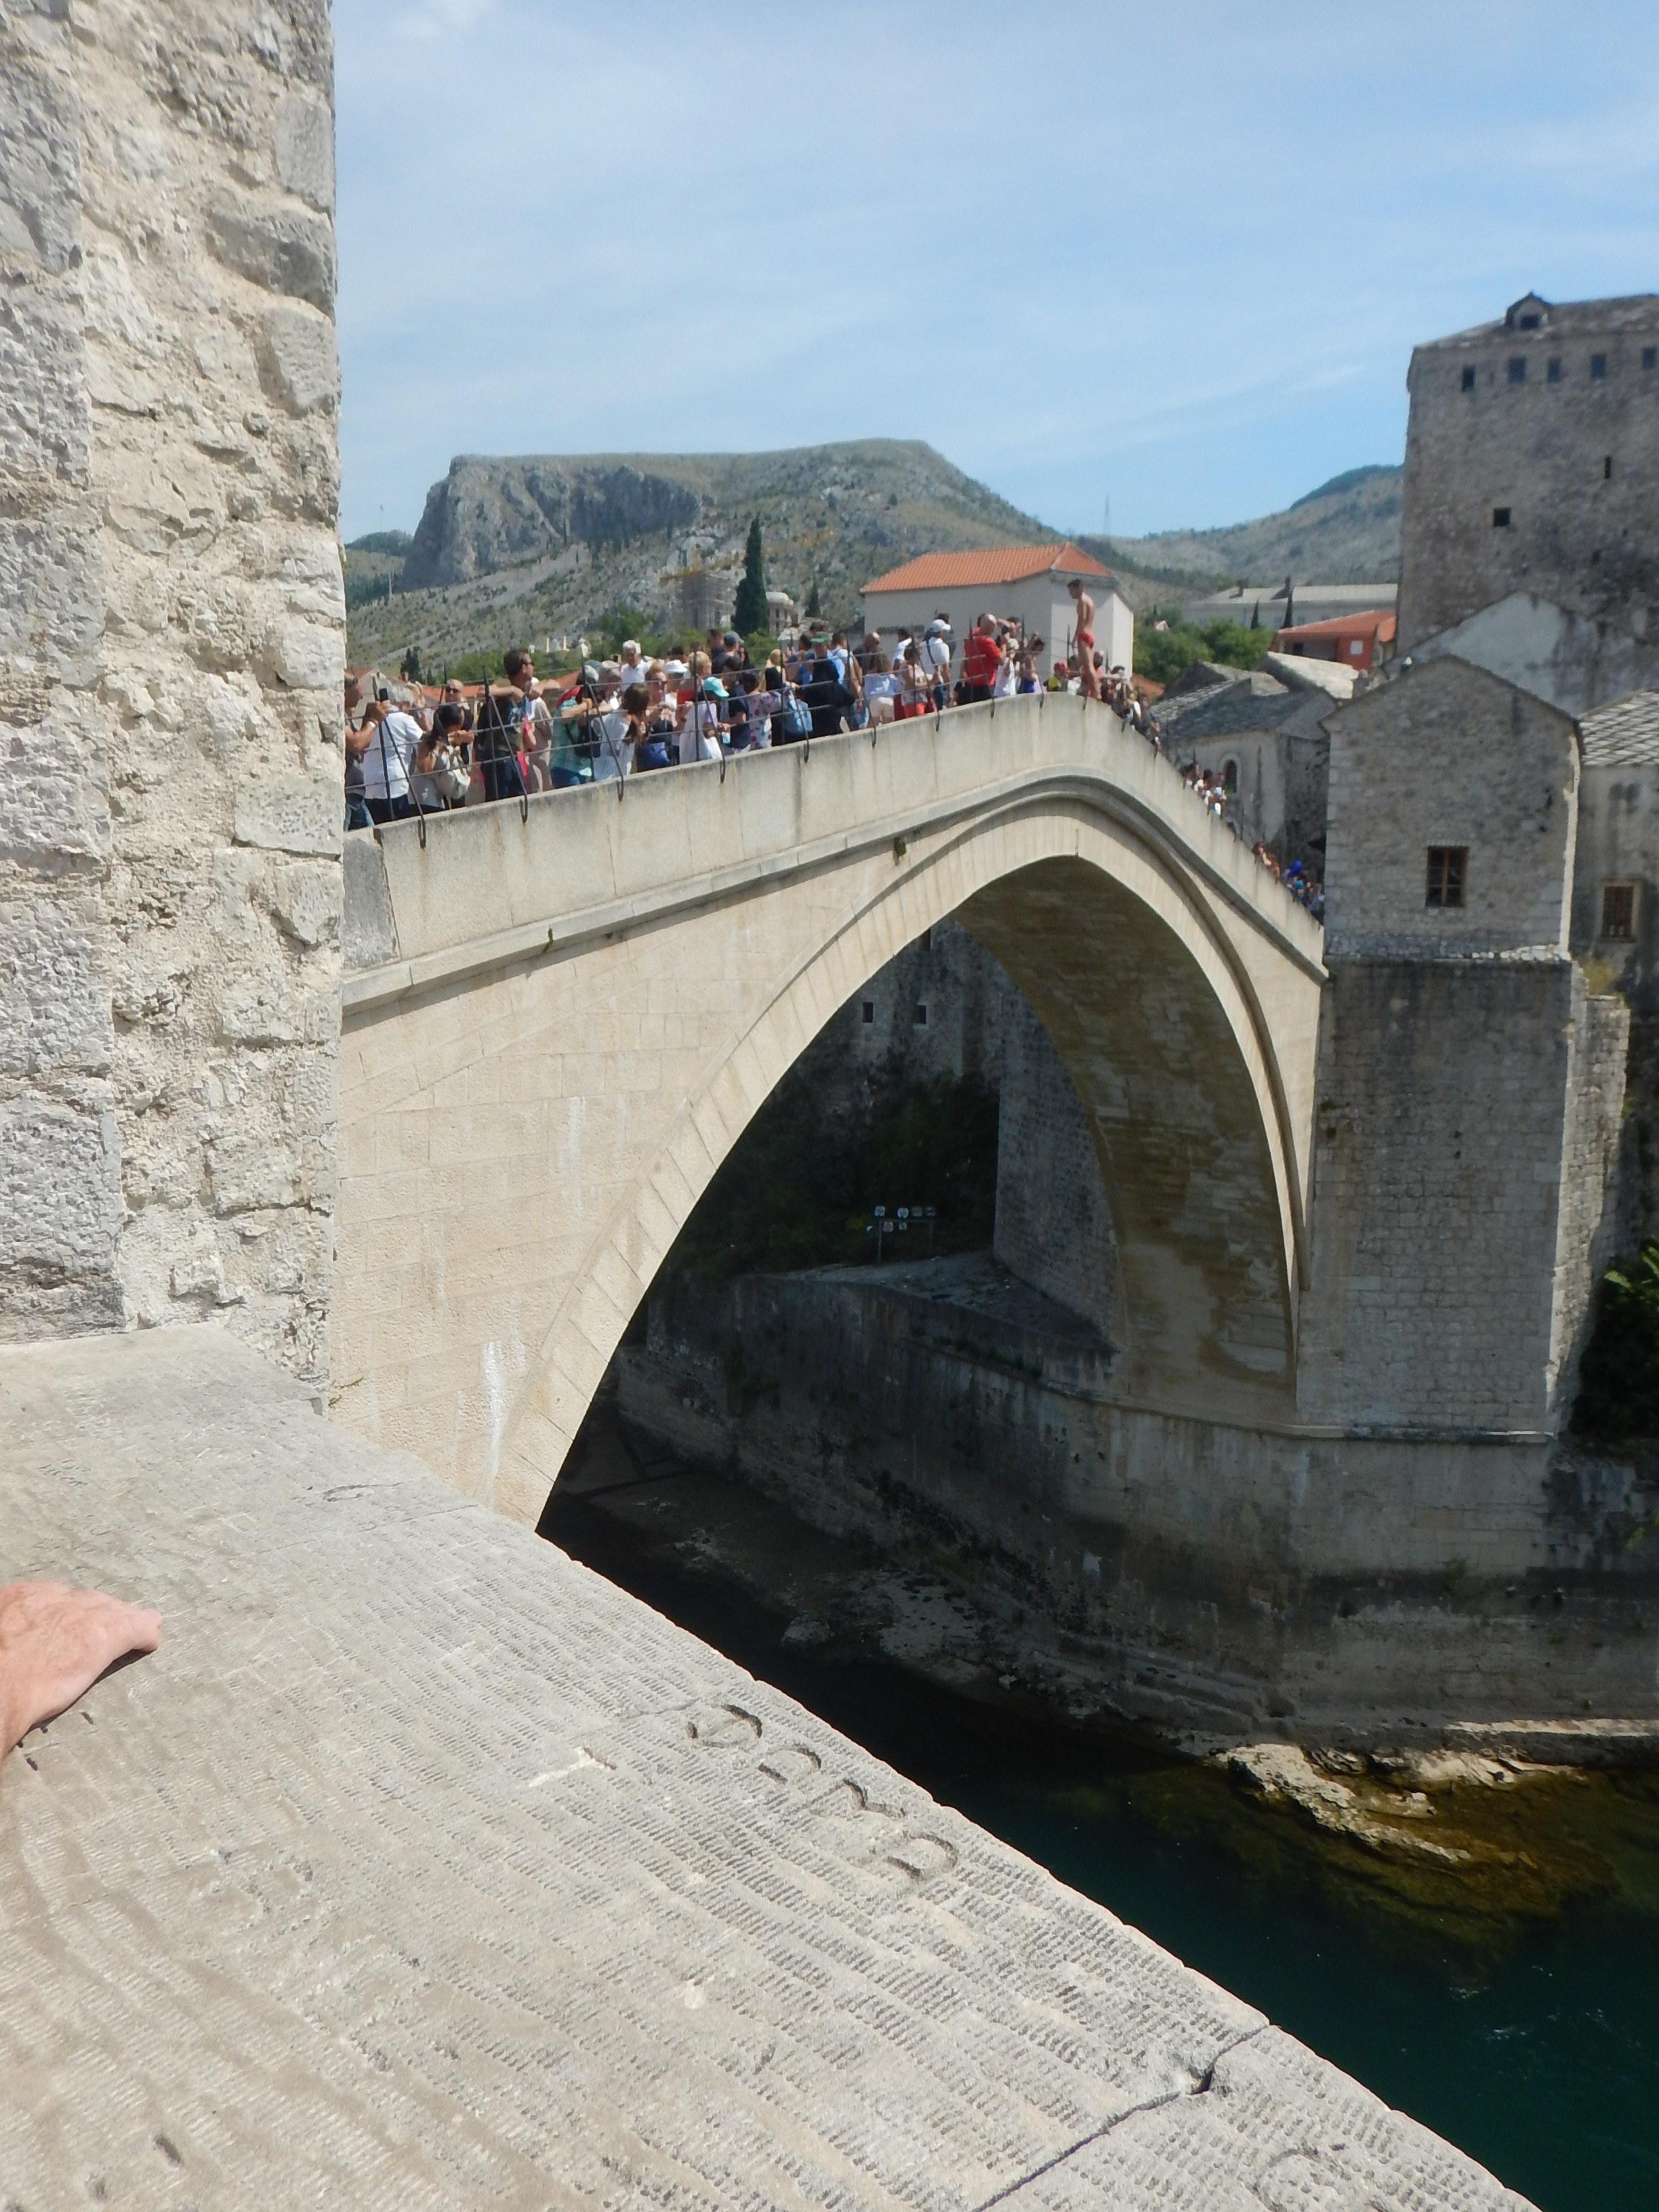 The beautiful Bridge, built, bombed and rebuilt